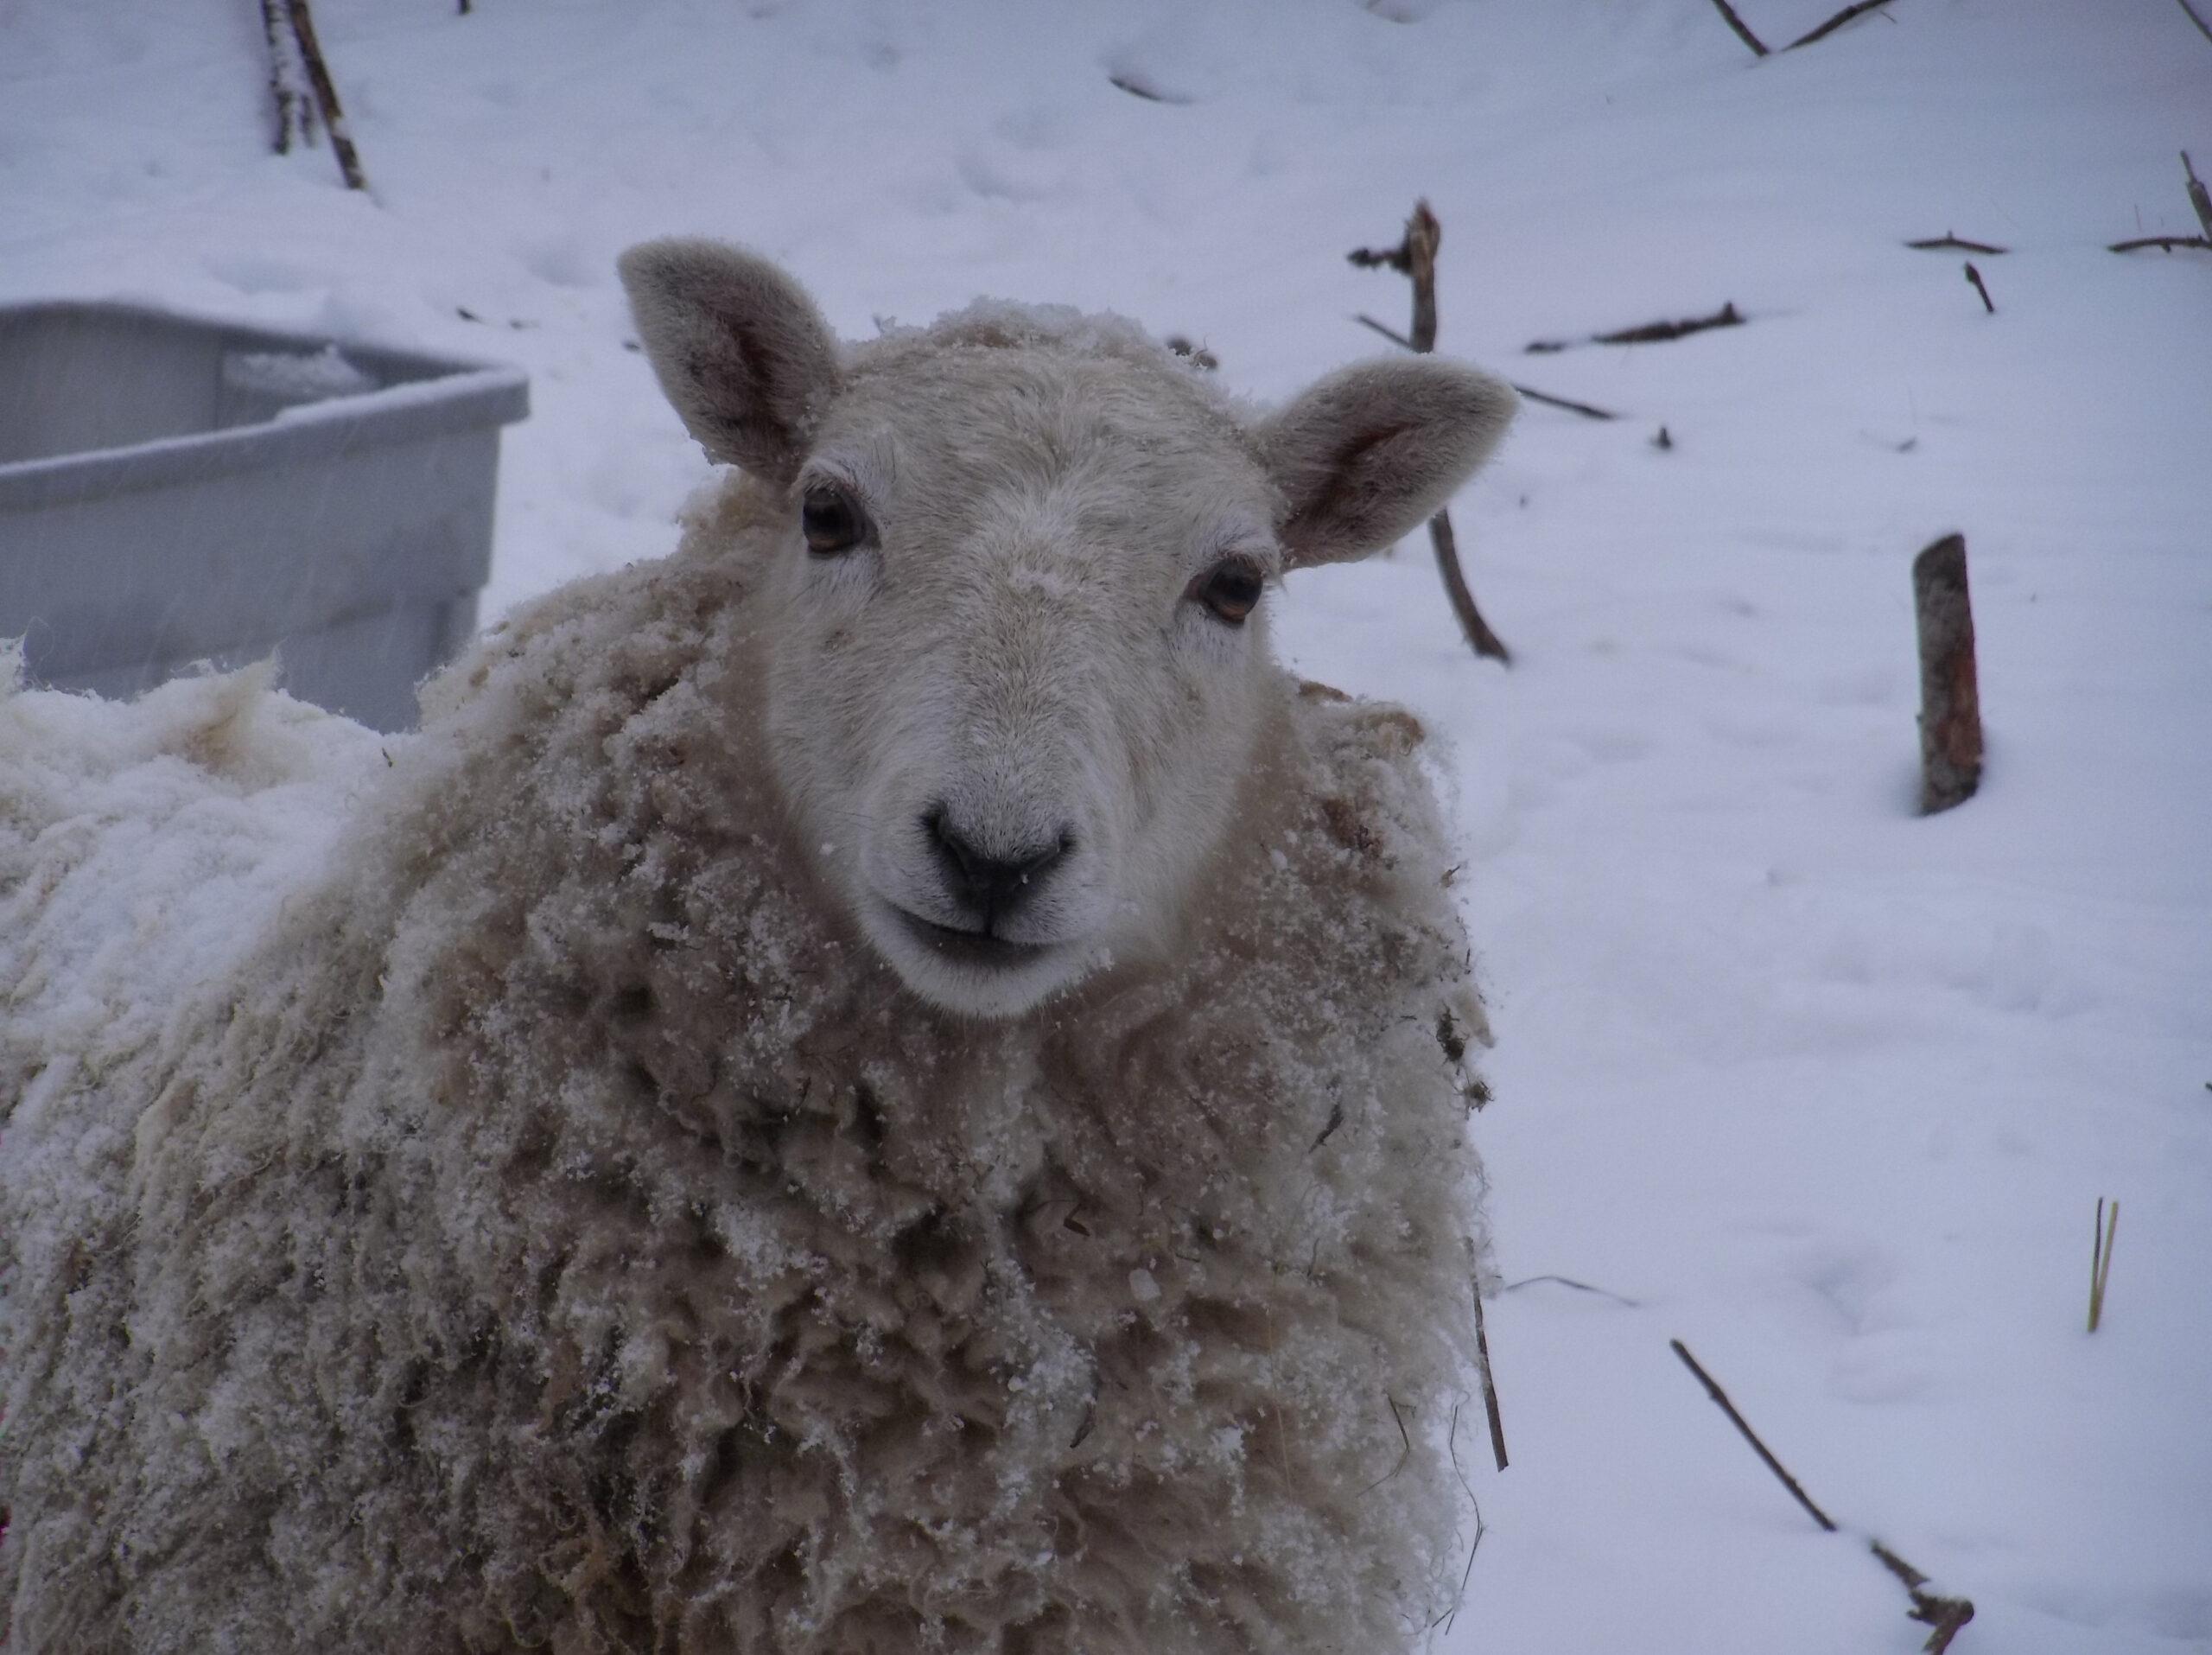 Foto Stok Gratis Tentang Binatang Peternakan, Domba, Dorset within Gambar Domba Dorset